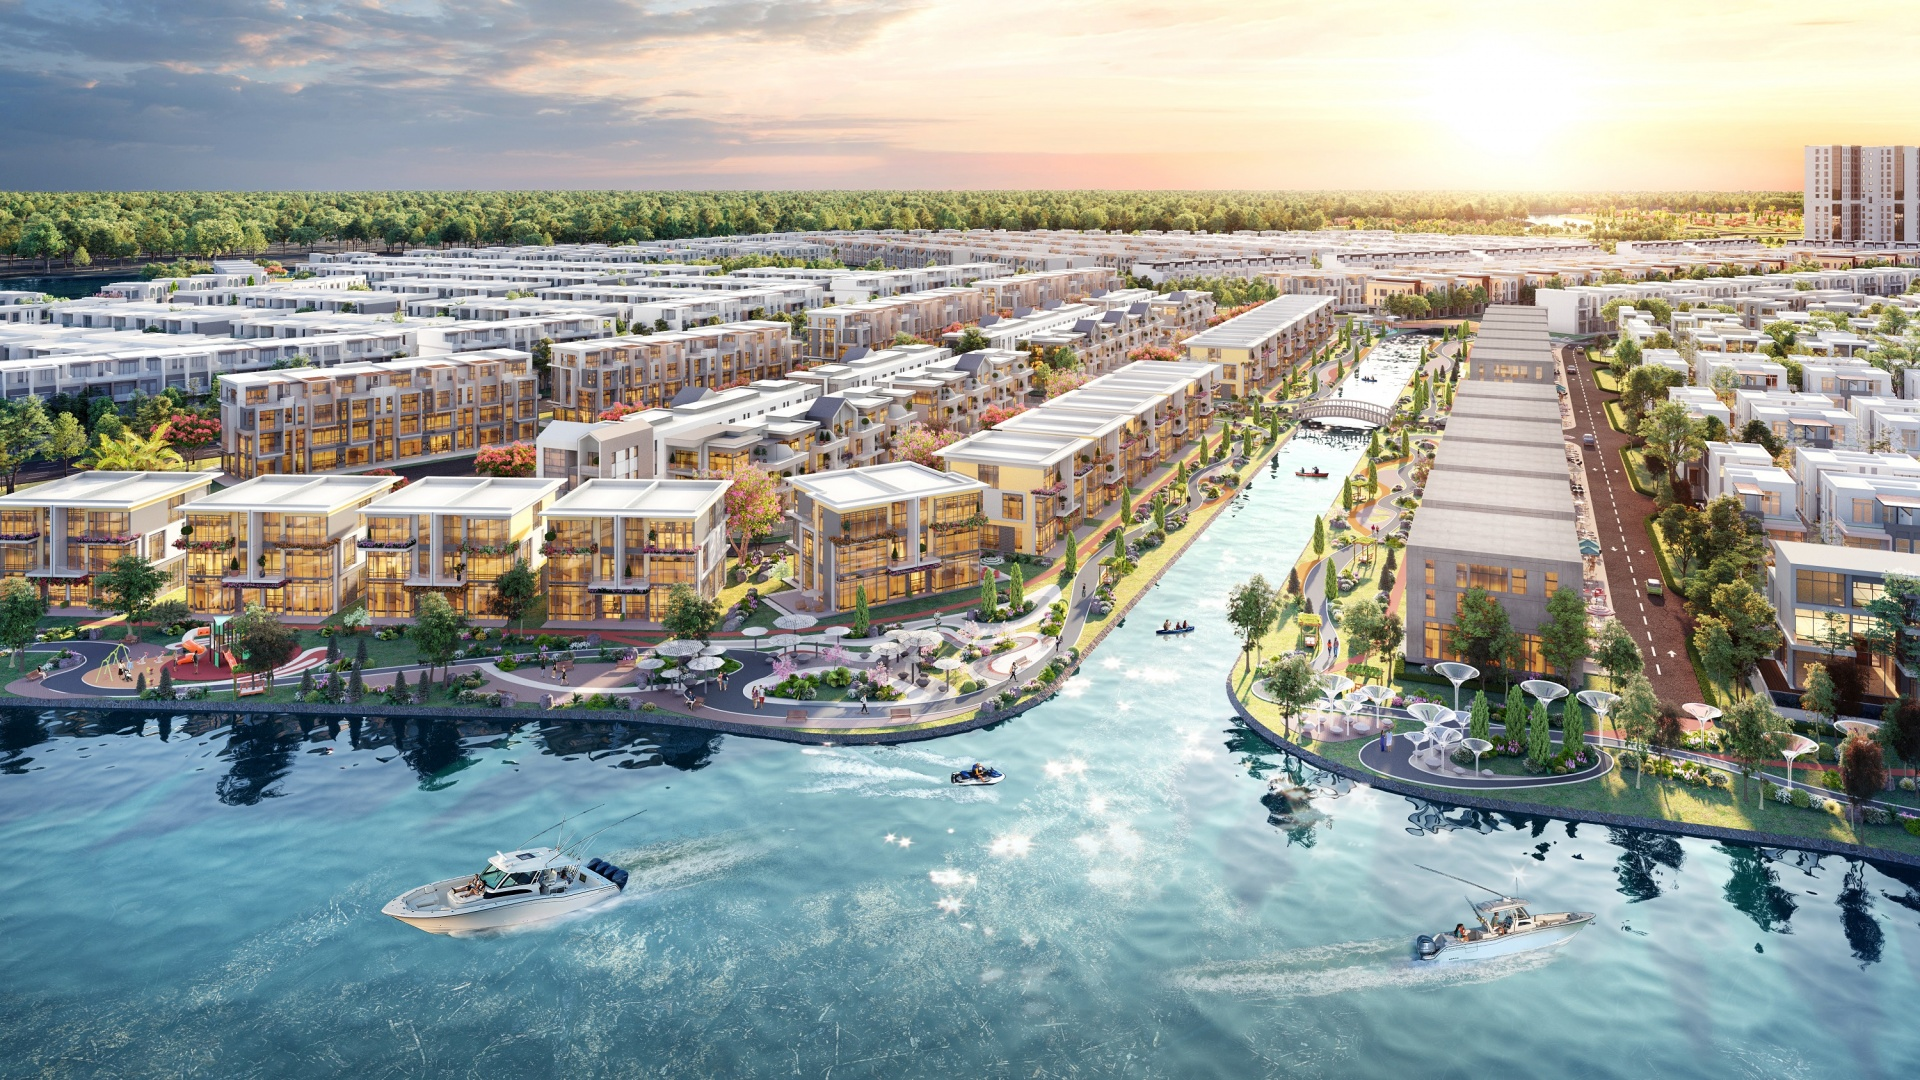 High-class amenities elevate value of Aqua City